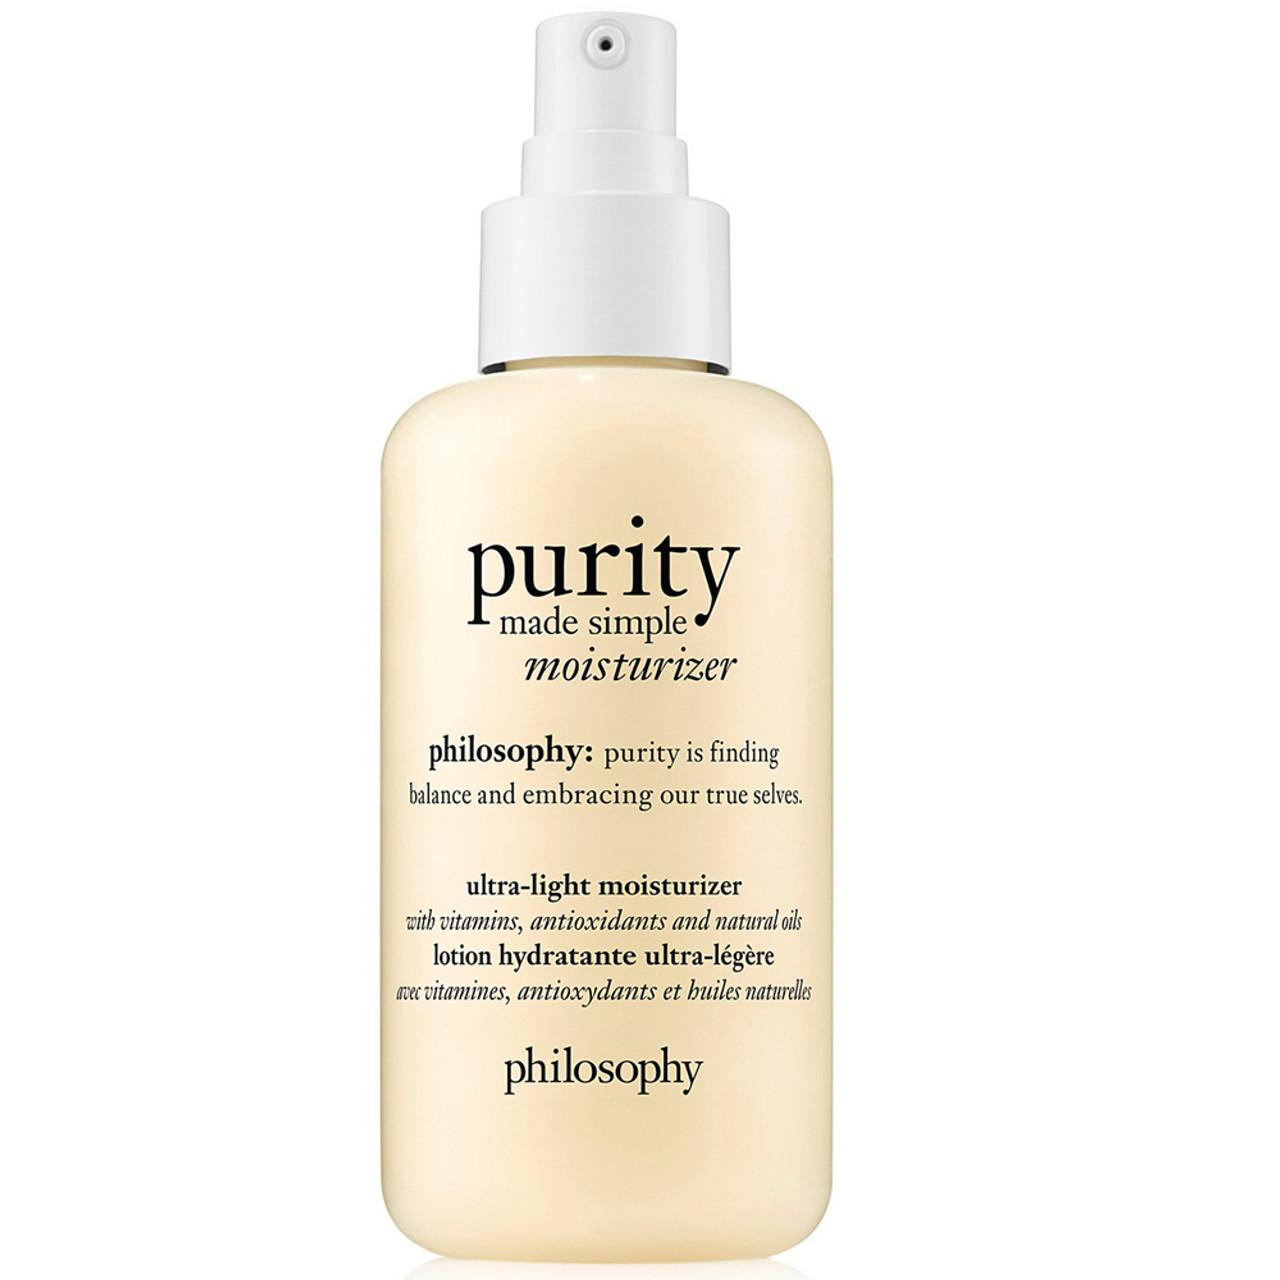 philosophy Purity Made Simple Ultra-Light Moisturizer BeautifiedYou.com